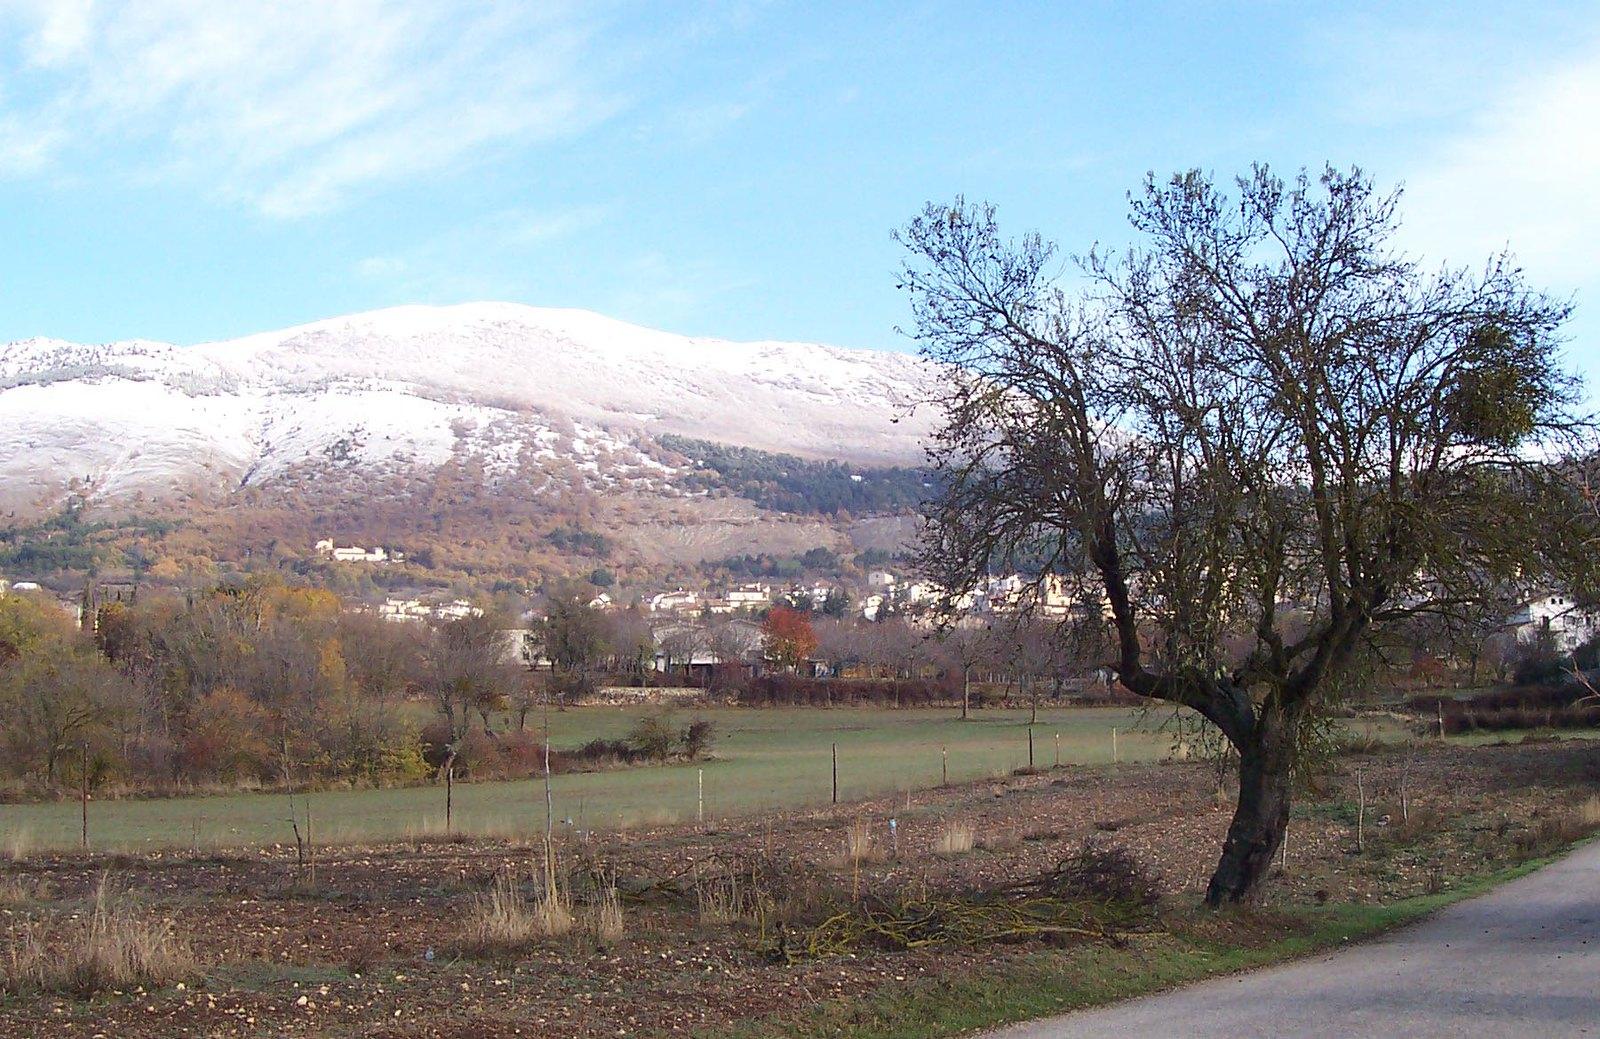 Barisciano